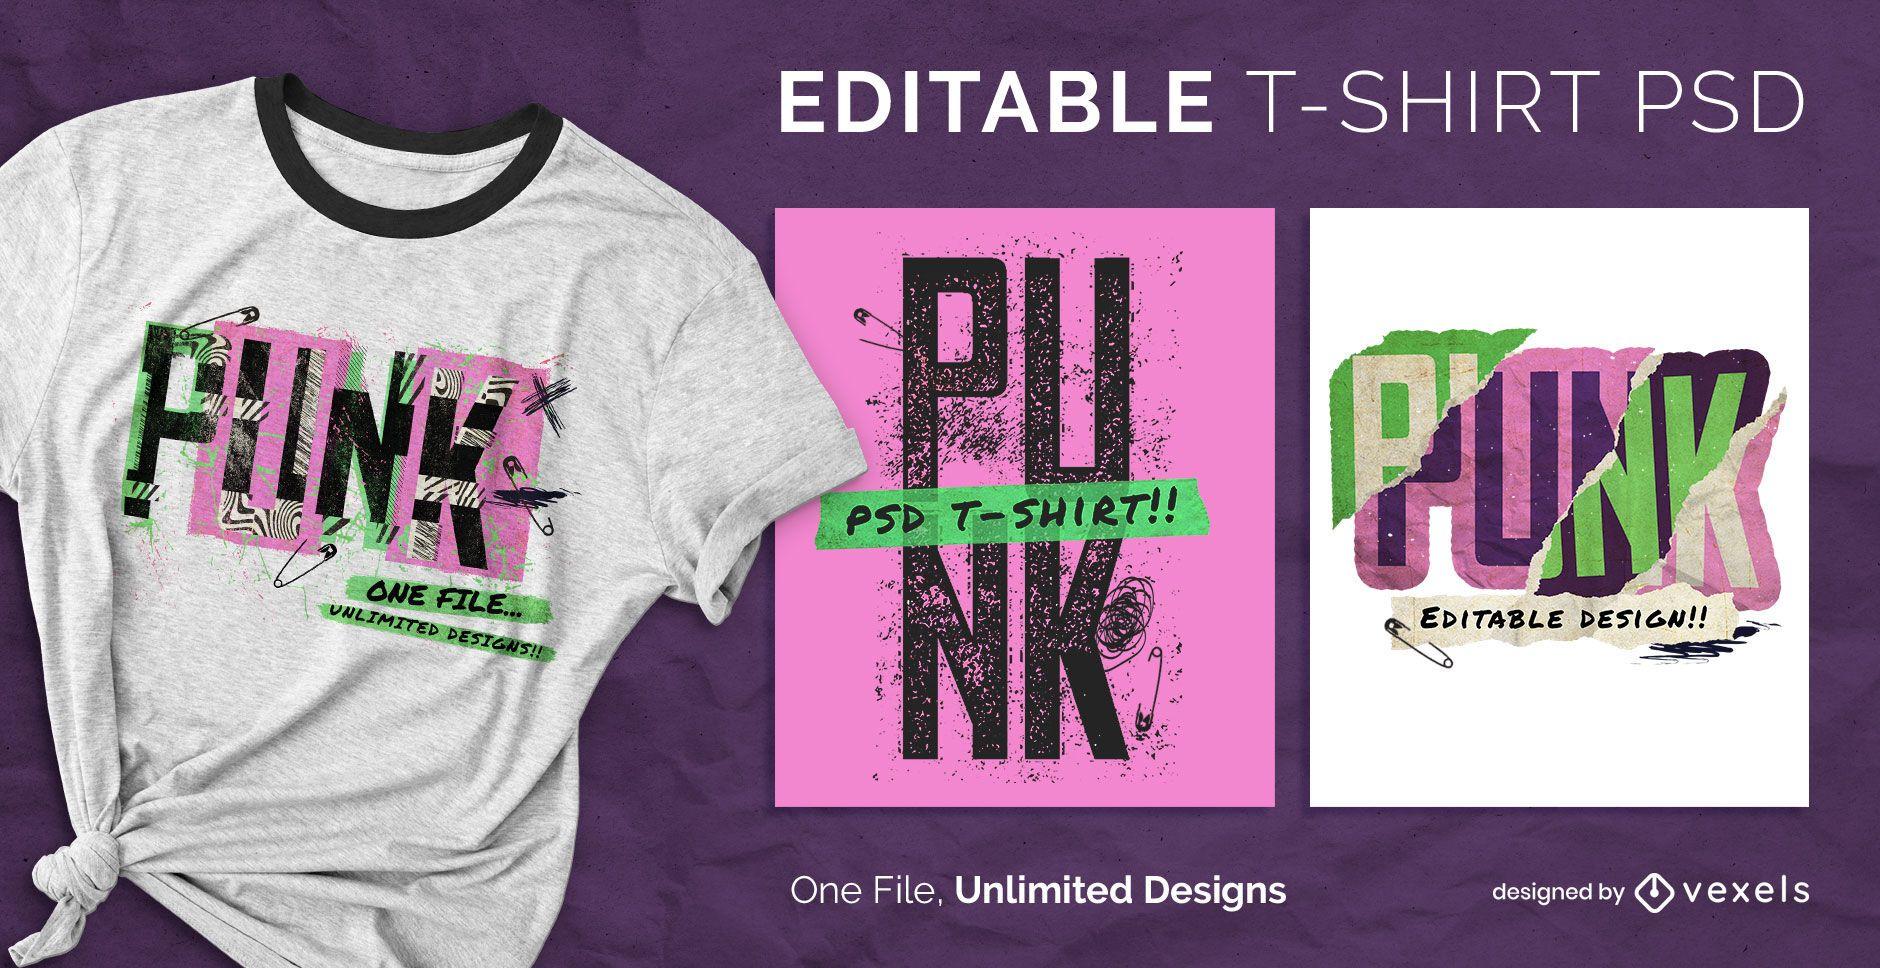 Skalierbares T-Shirt im Punk-Retro-Stil psd